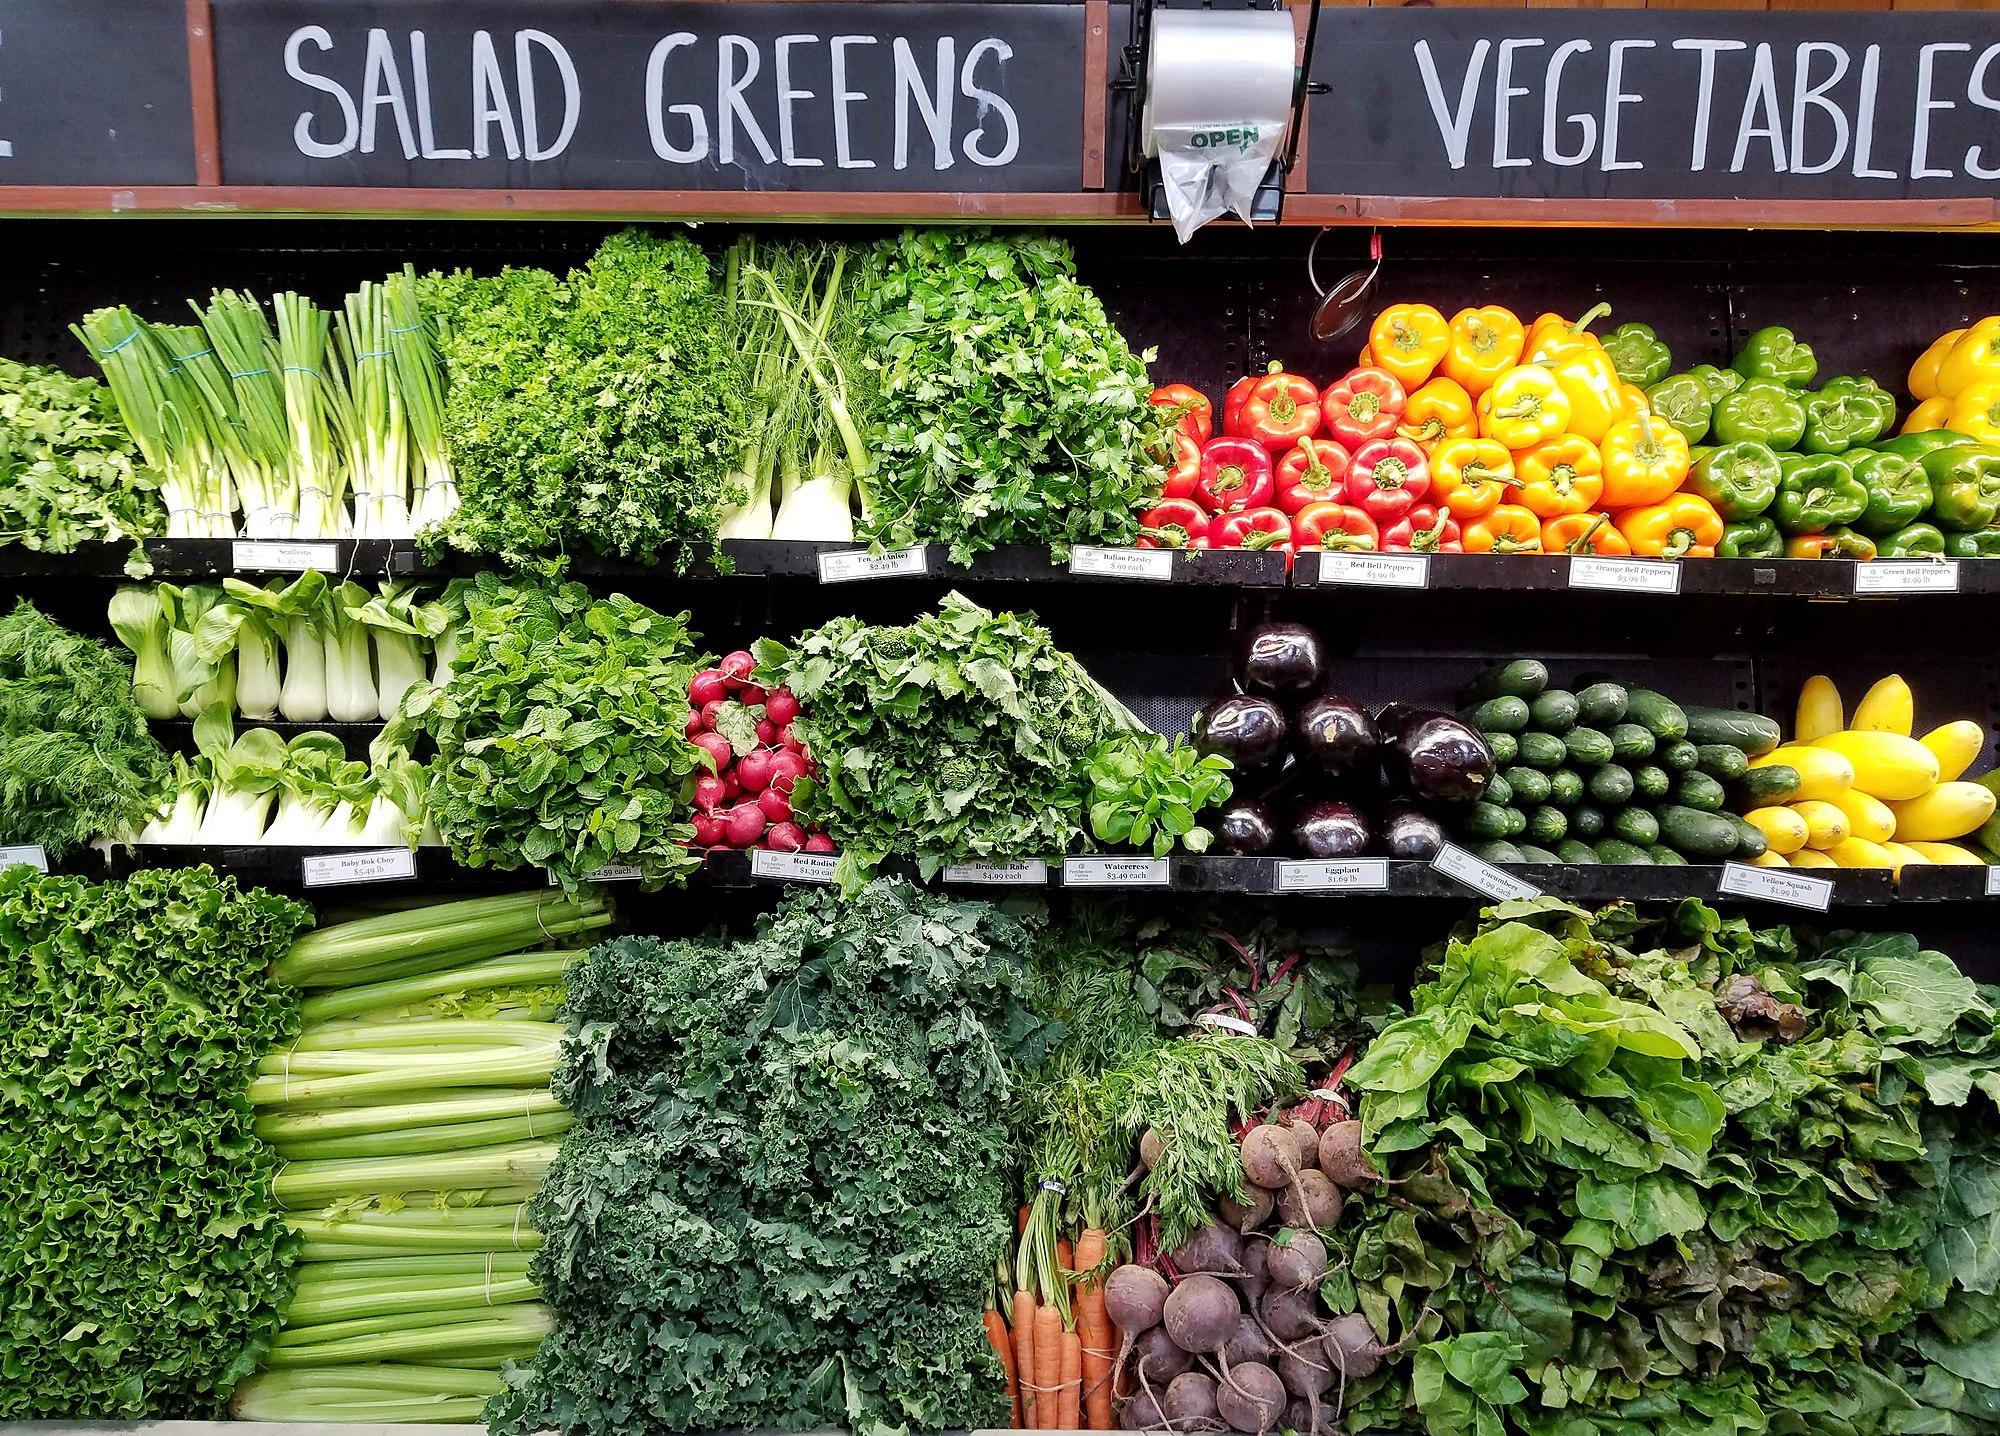 Salad greens and vegetables - Cambridge, MA.jpg